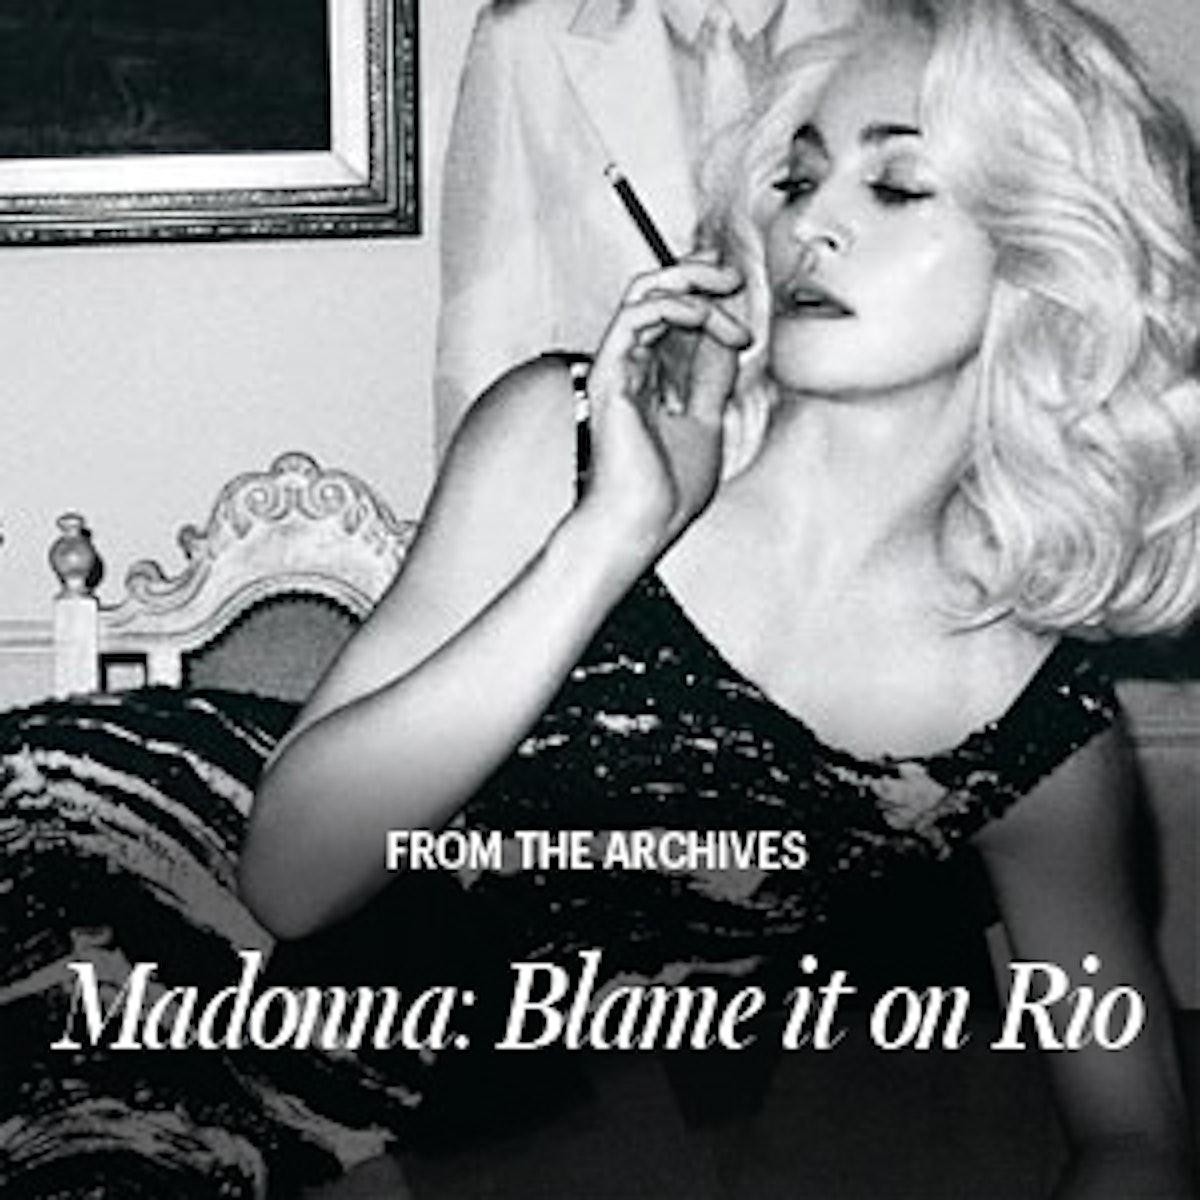 madonna-blame-it-on-rio-archive